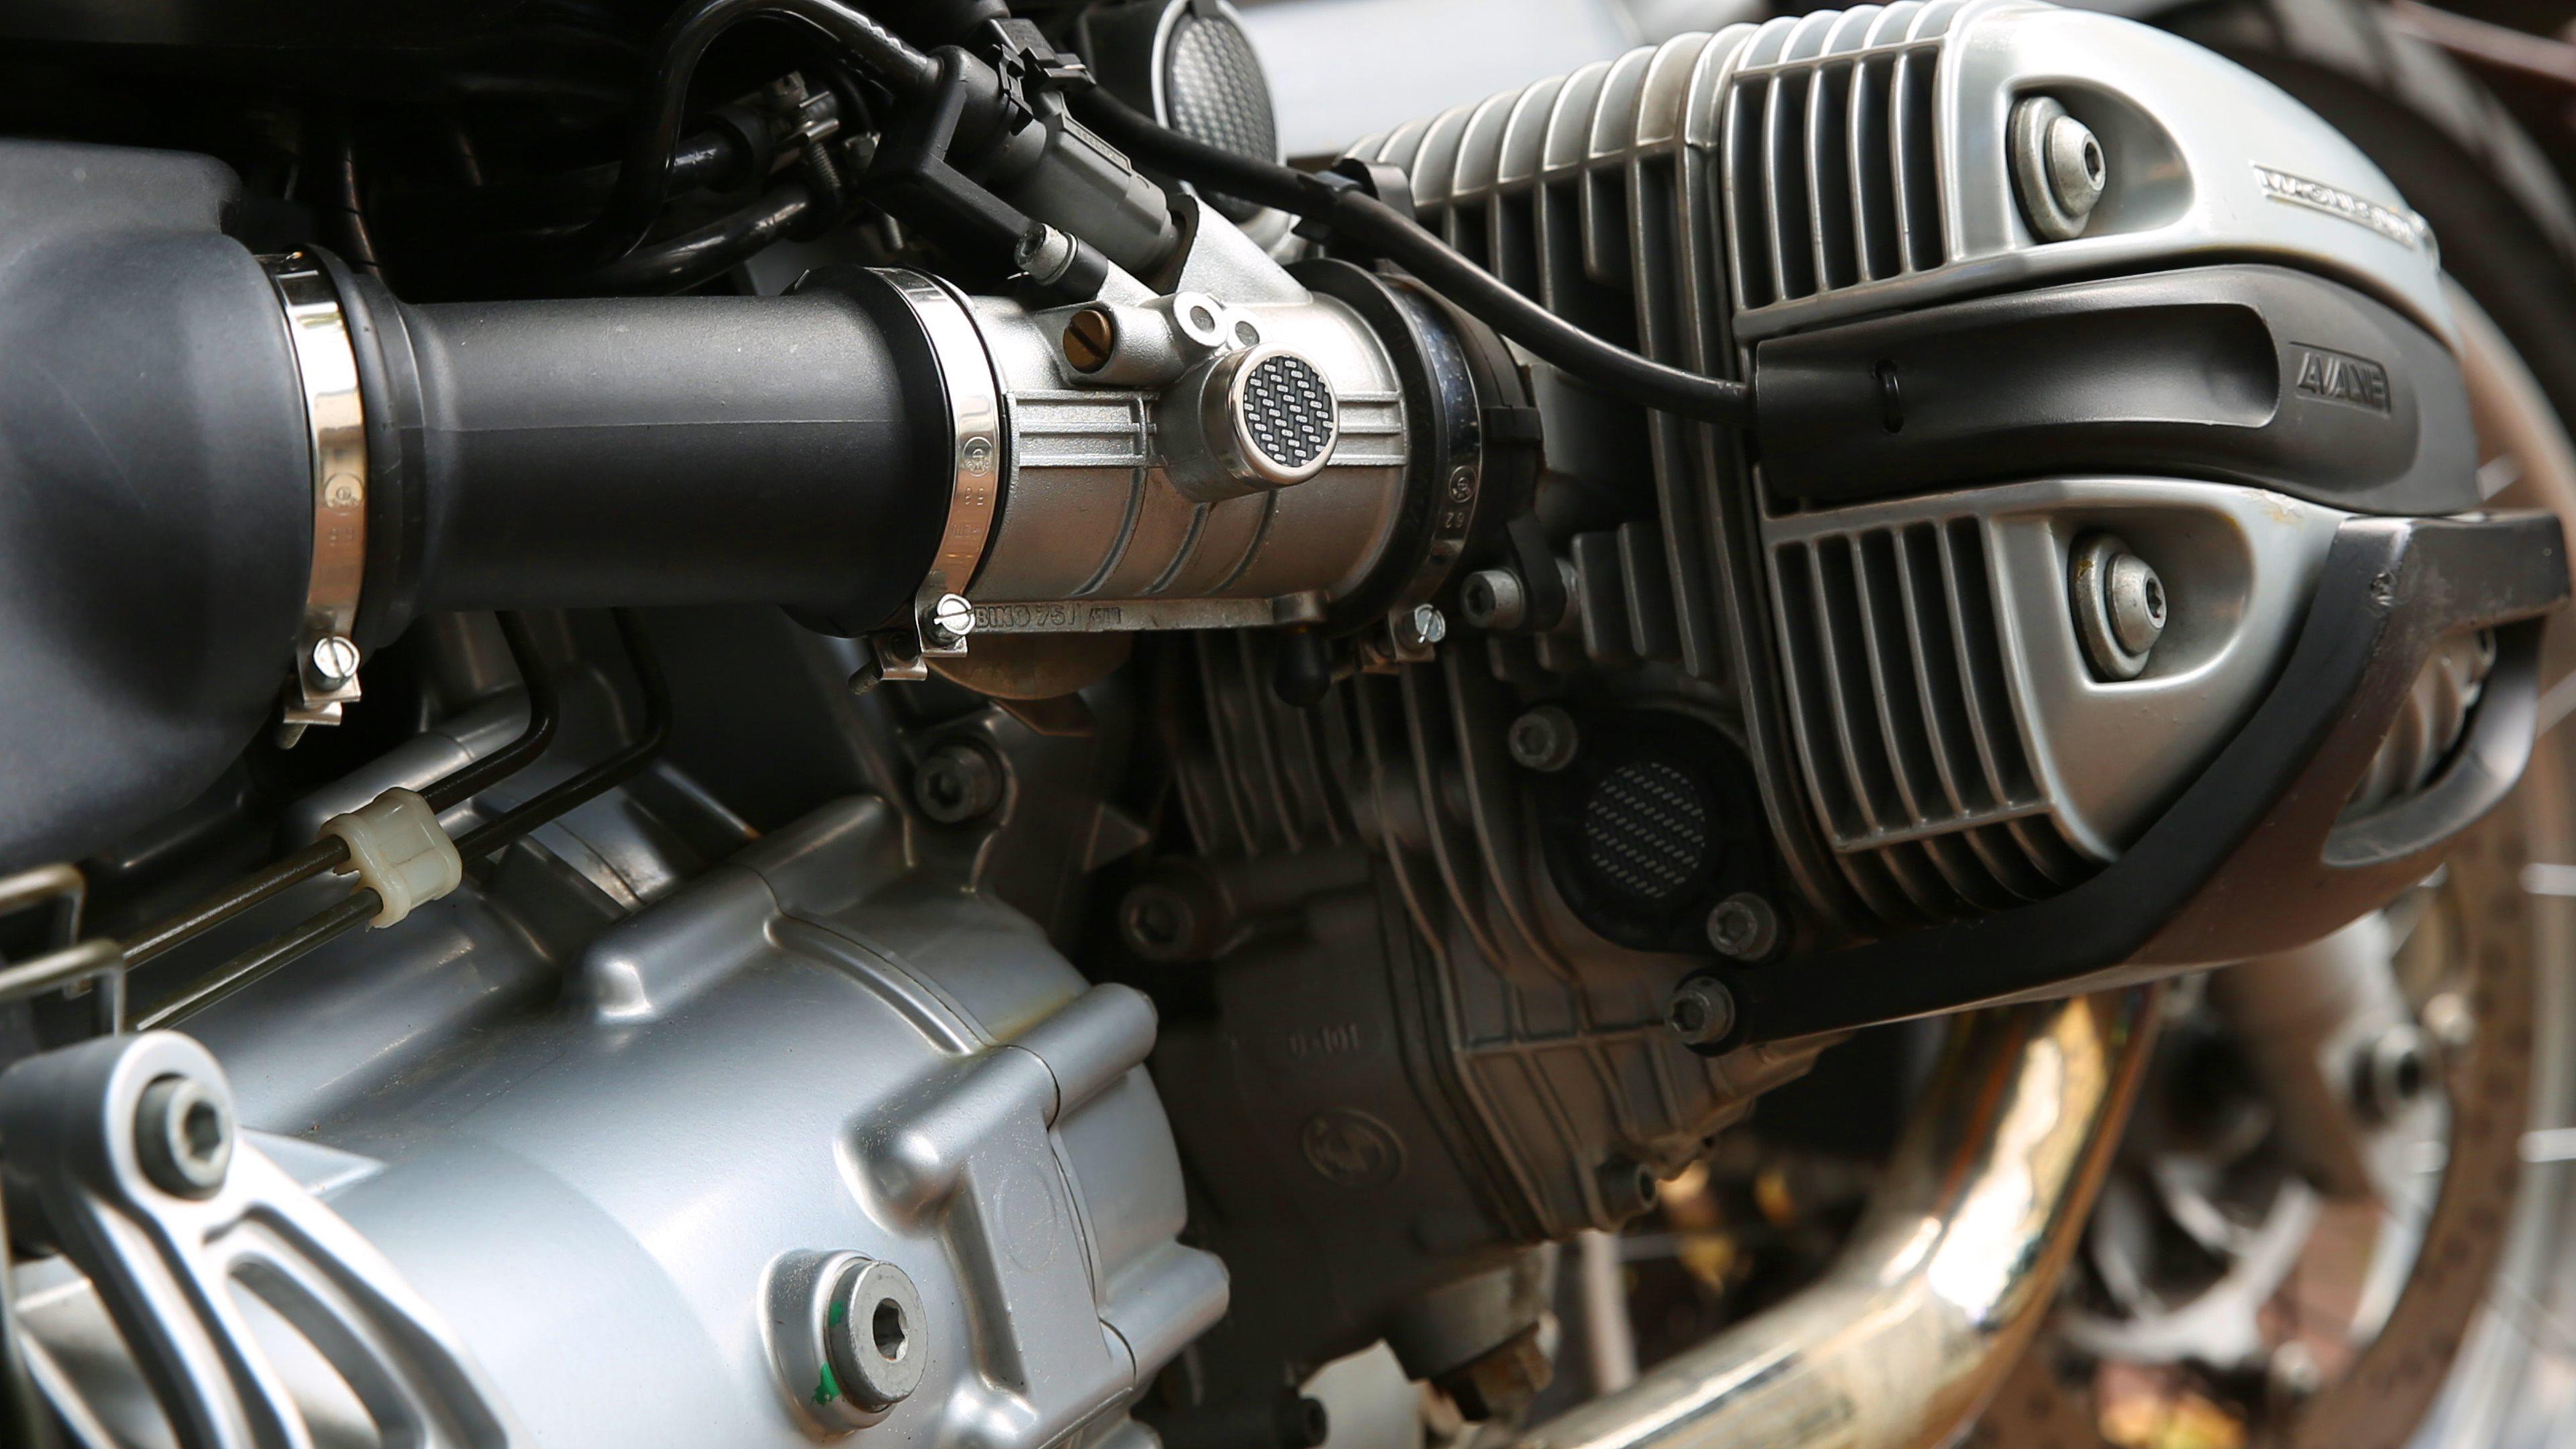 motorcycle engine wallpaper hd wwwpixsharkcom images